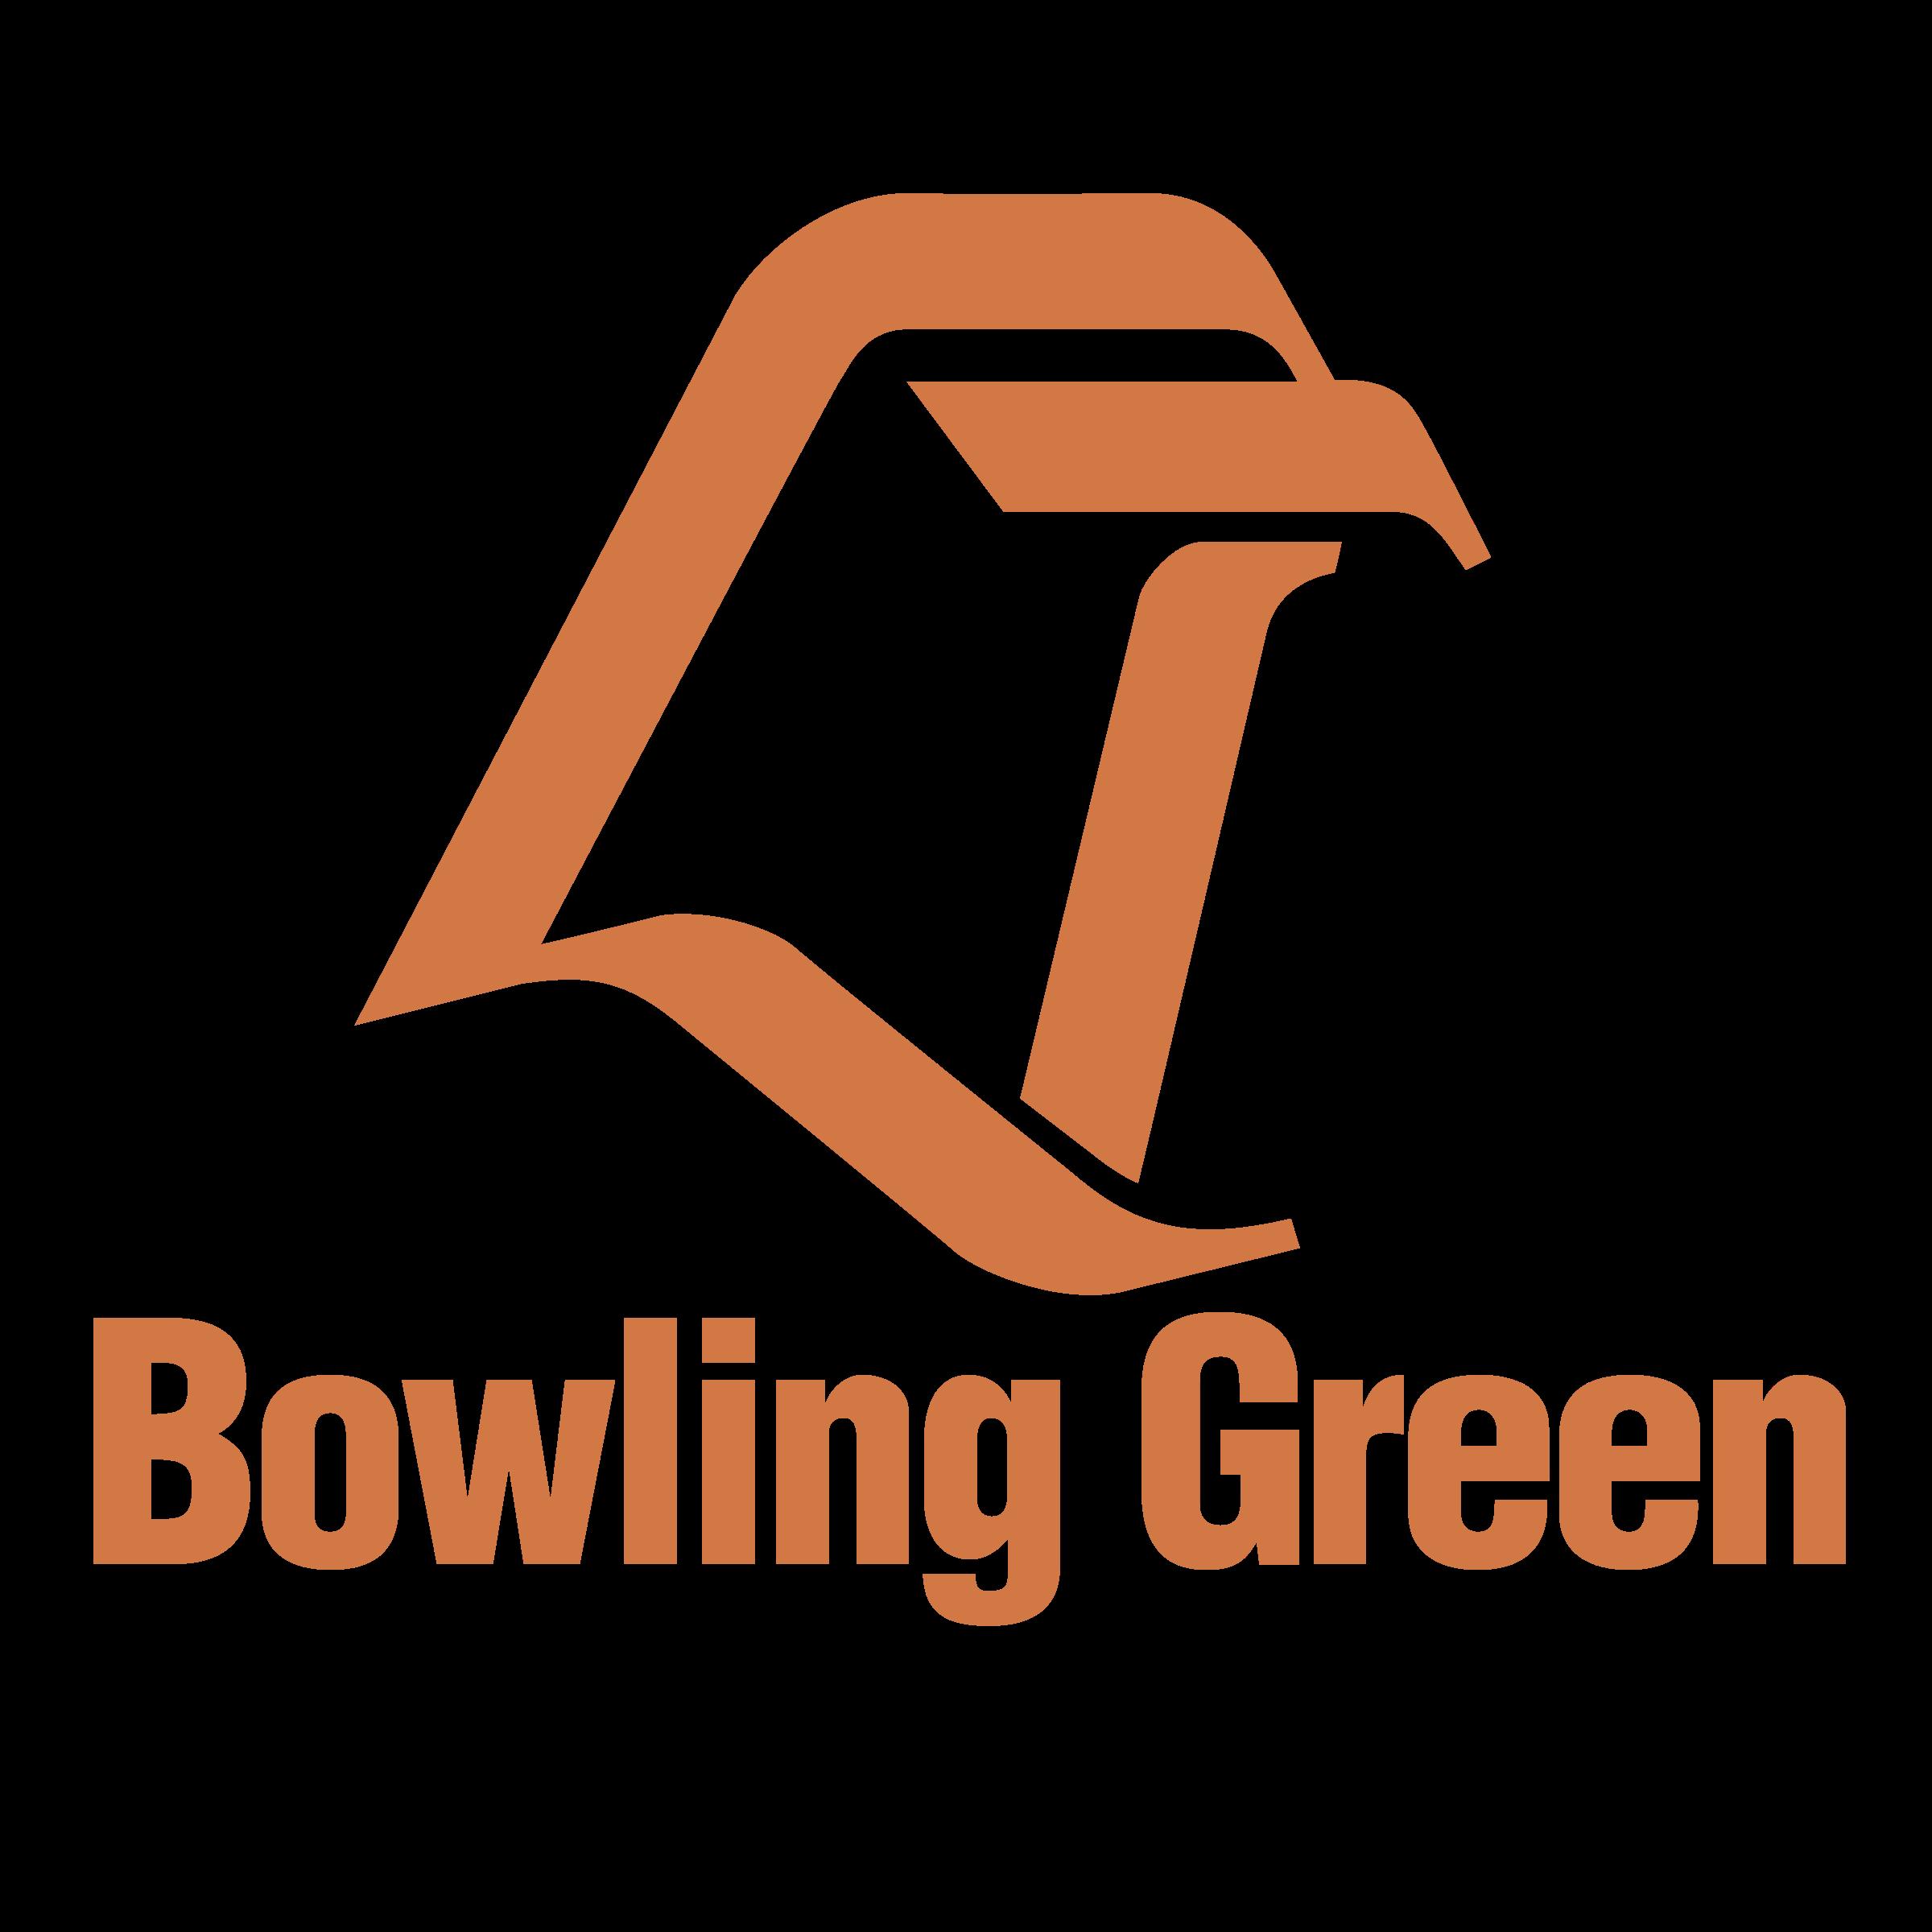 Bowling Green Falcons 01 Logo PNG Transparent & SVG Vector ...